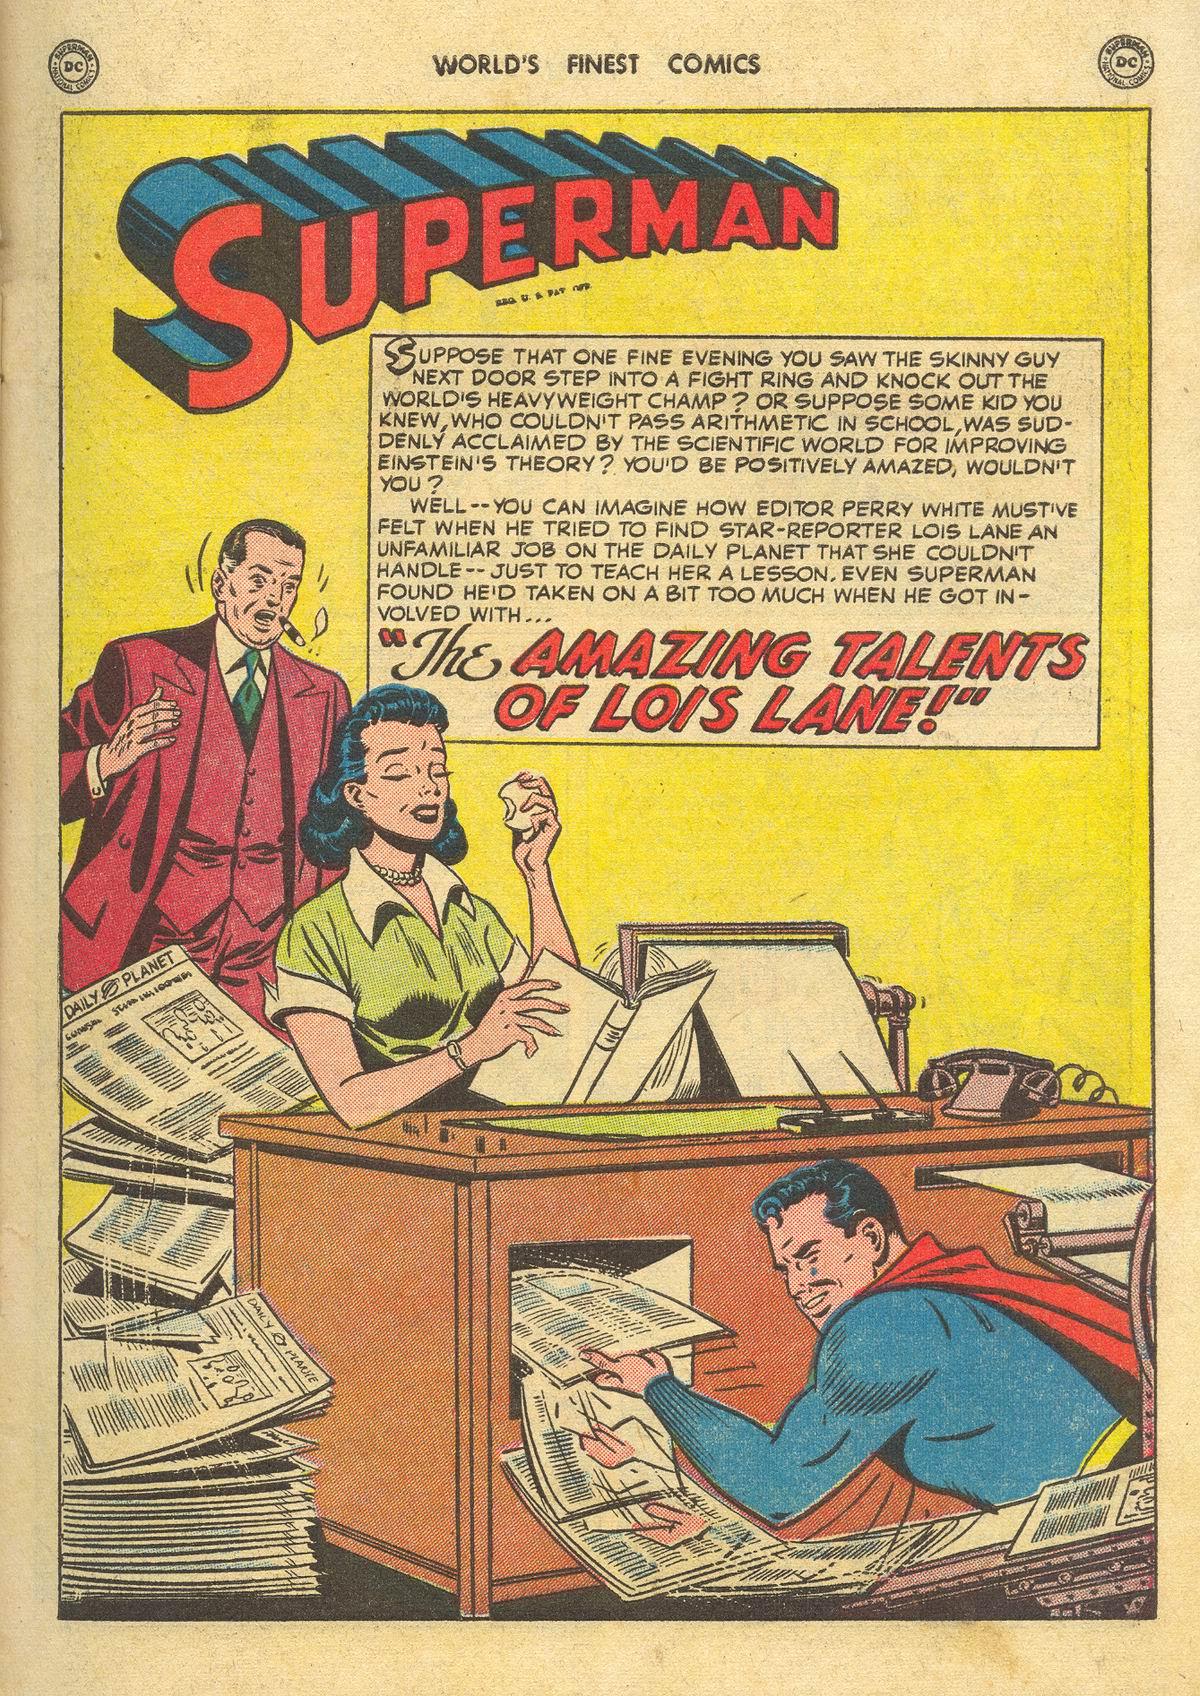 Read online World's Finest Comics comic -  Issue #51 - 3